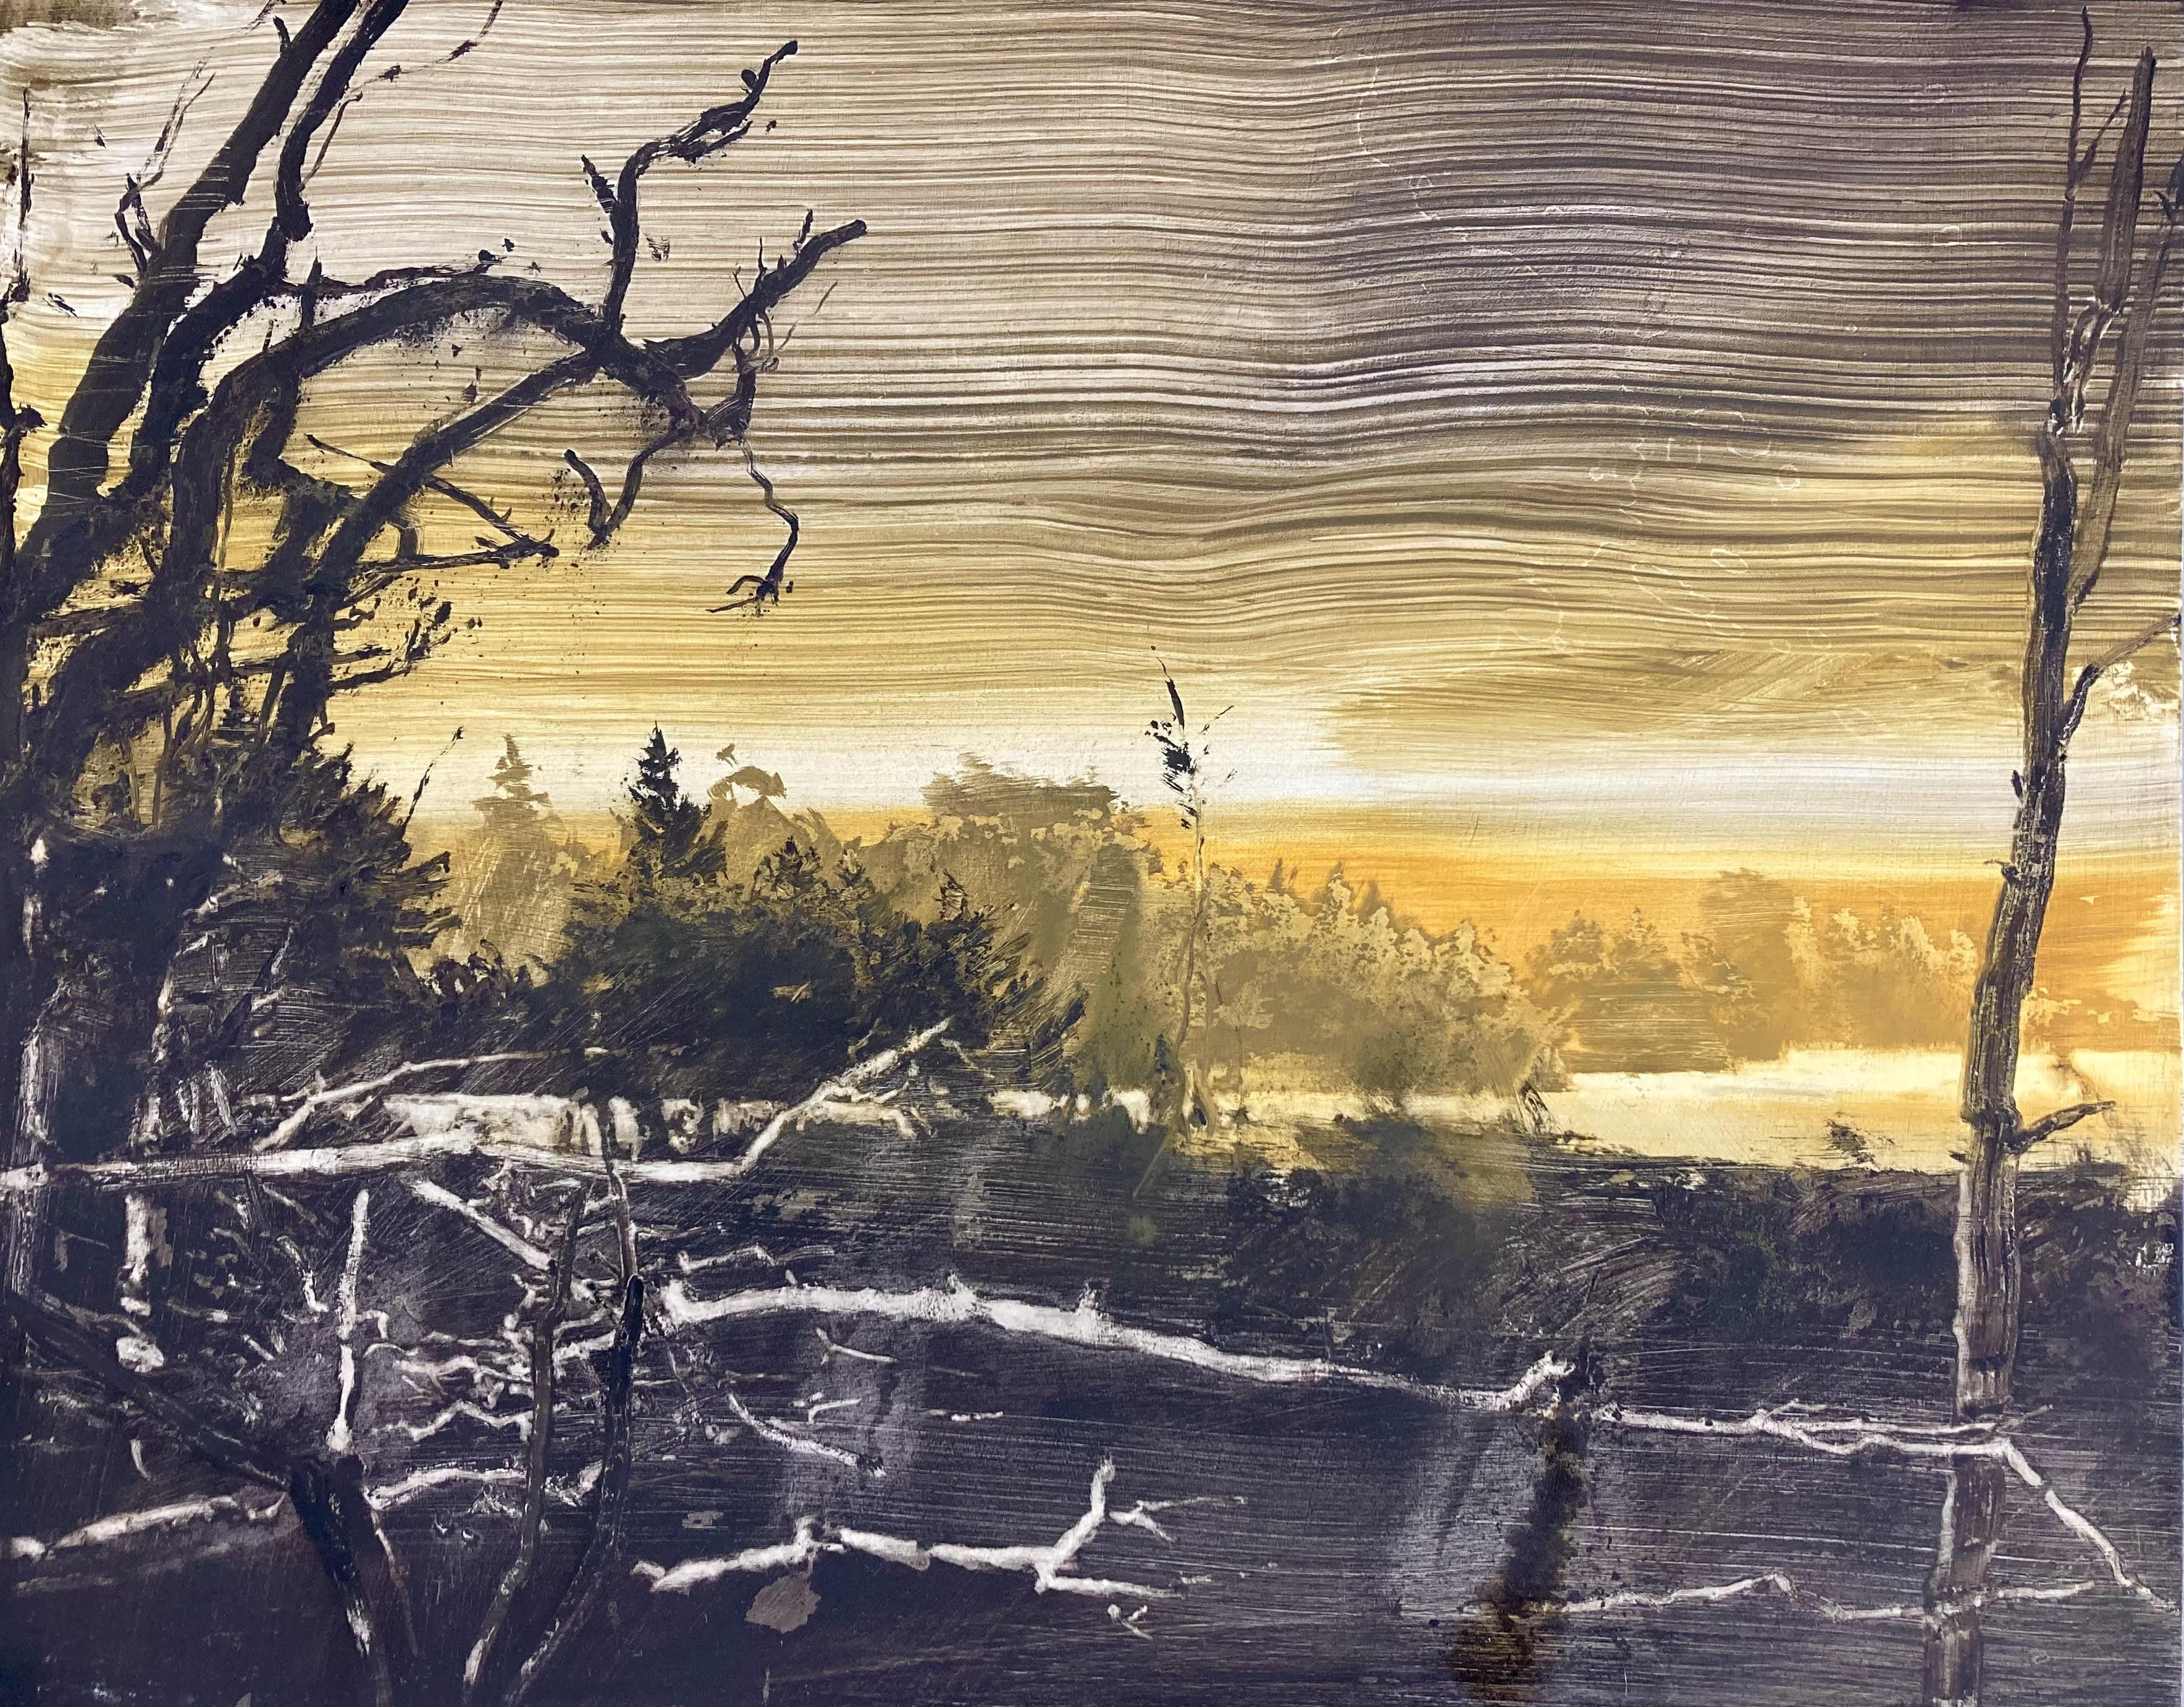 Lake edge - summer solstice by David Smith